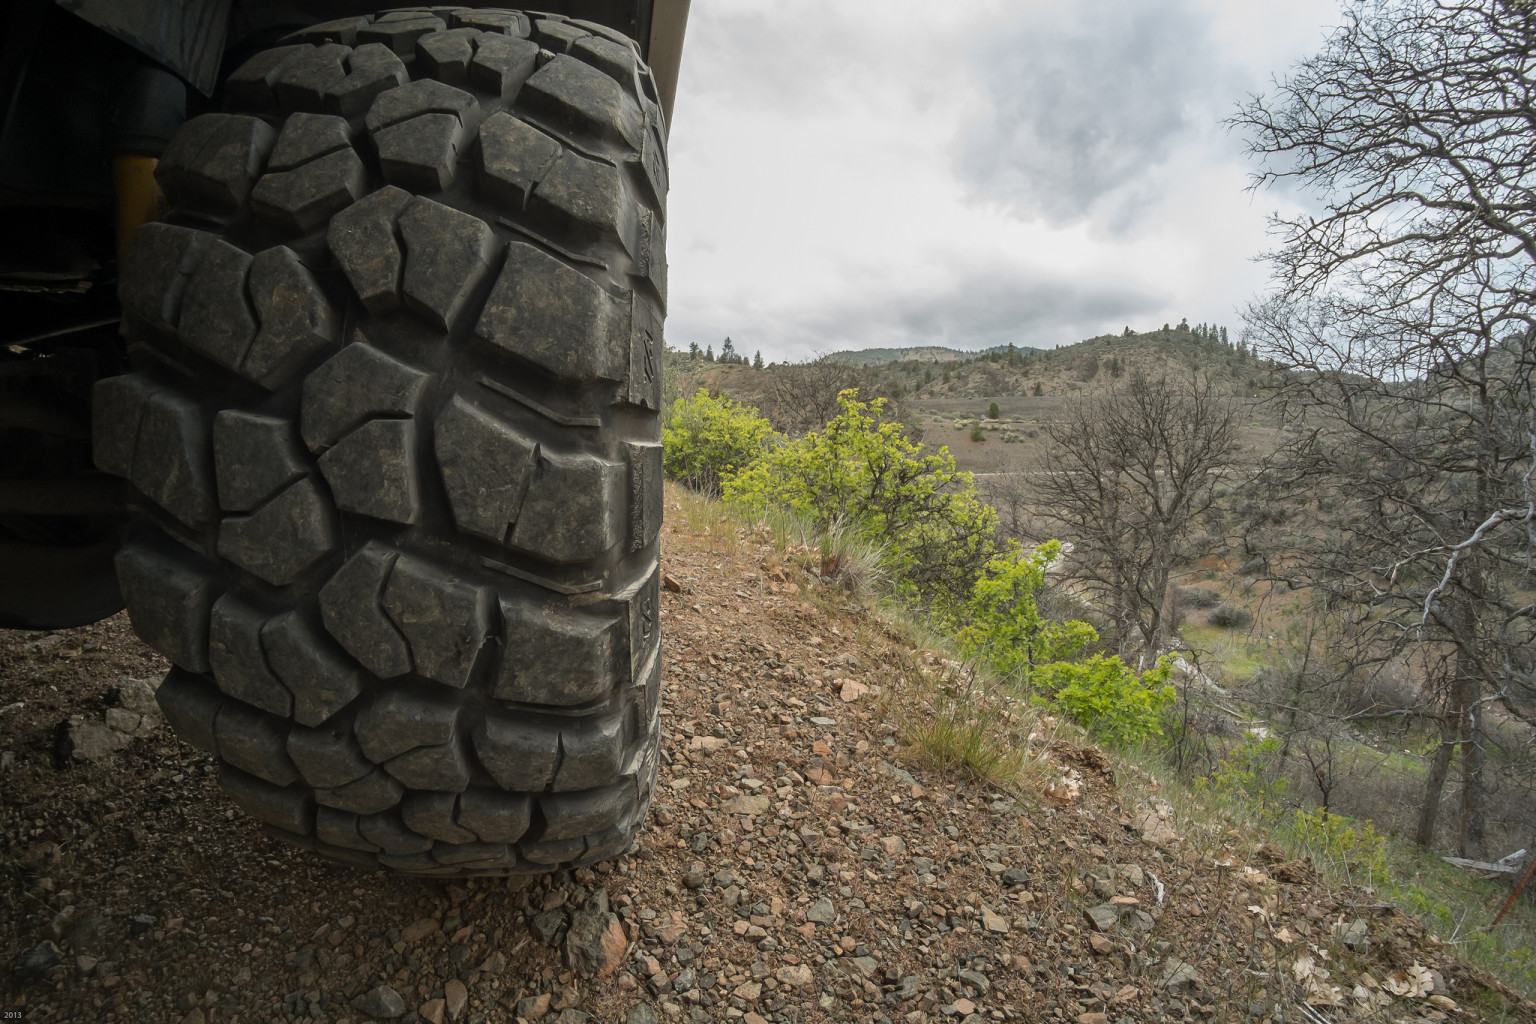 Review Bf Goodrich Mud Terrain Tires Adventure Ready